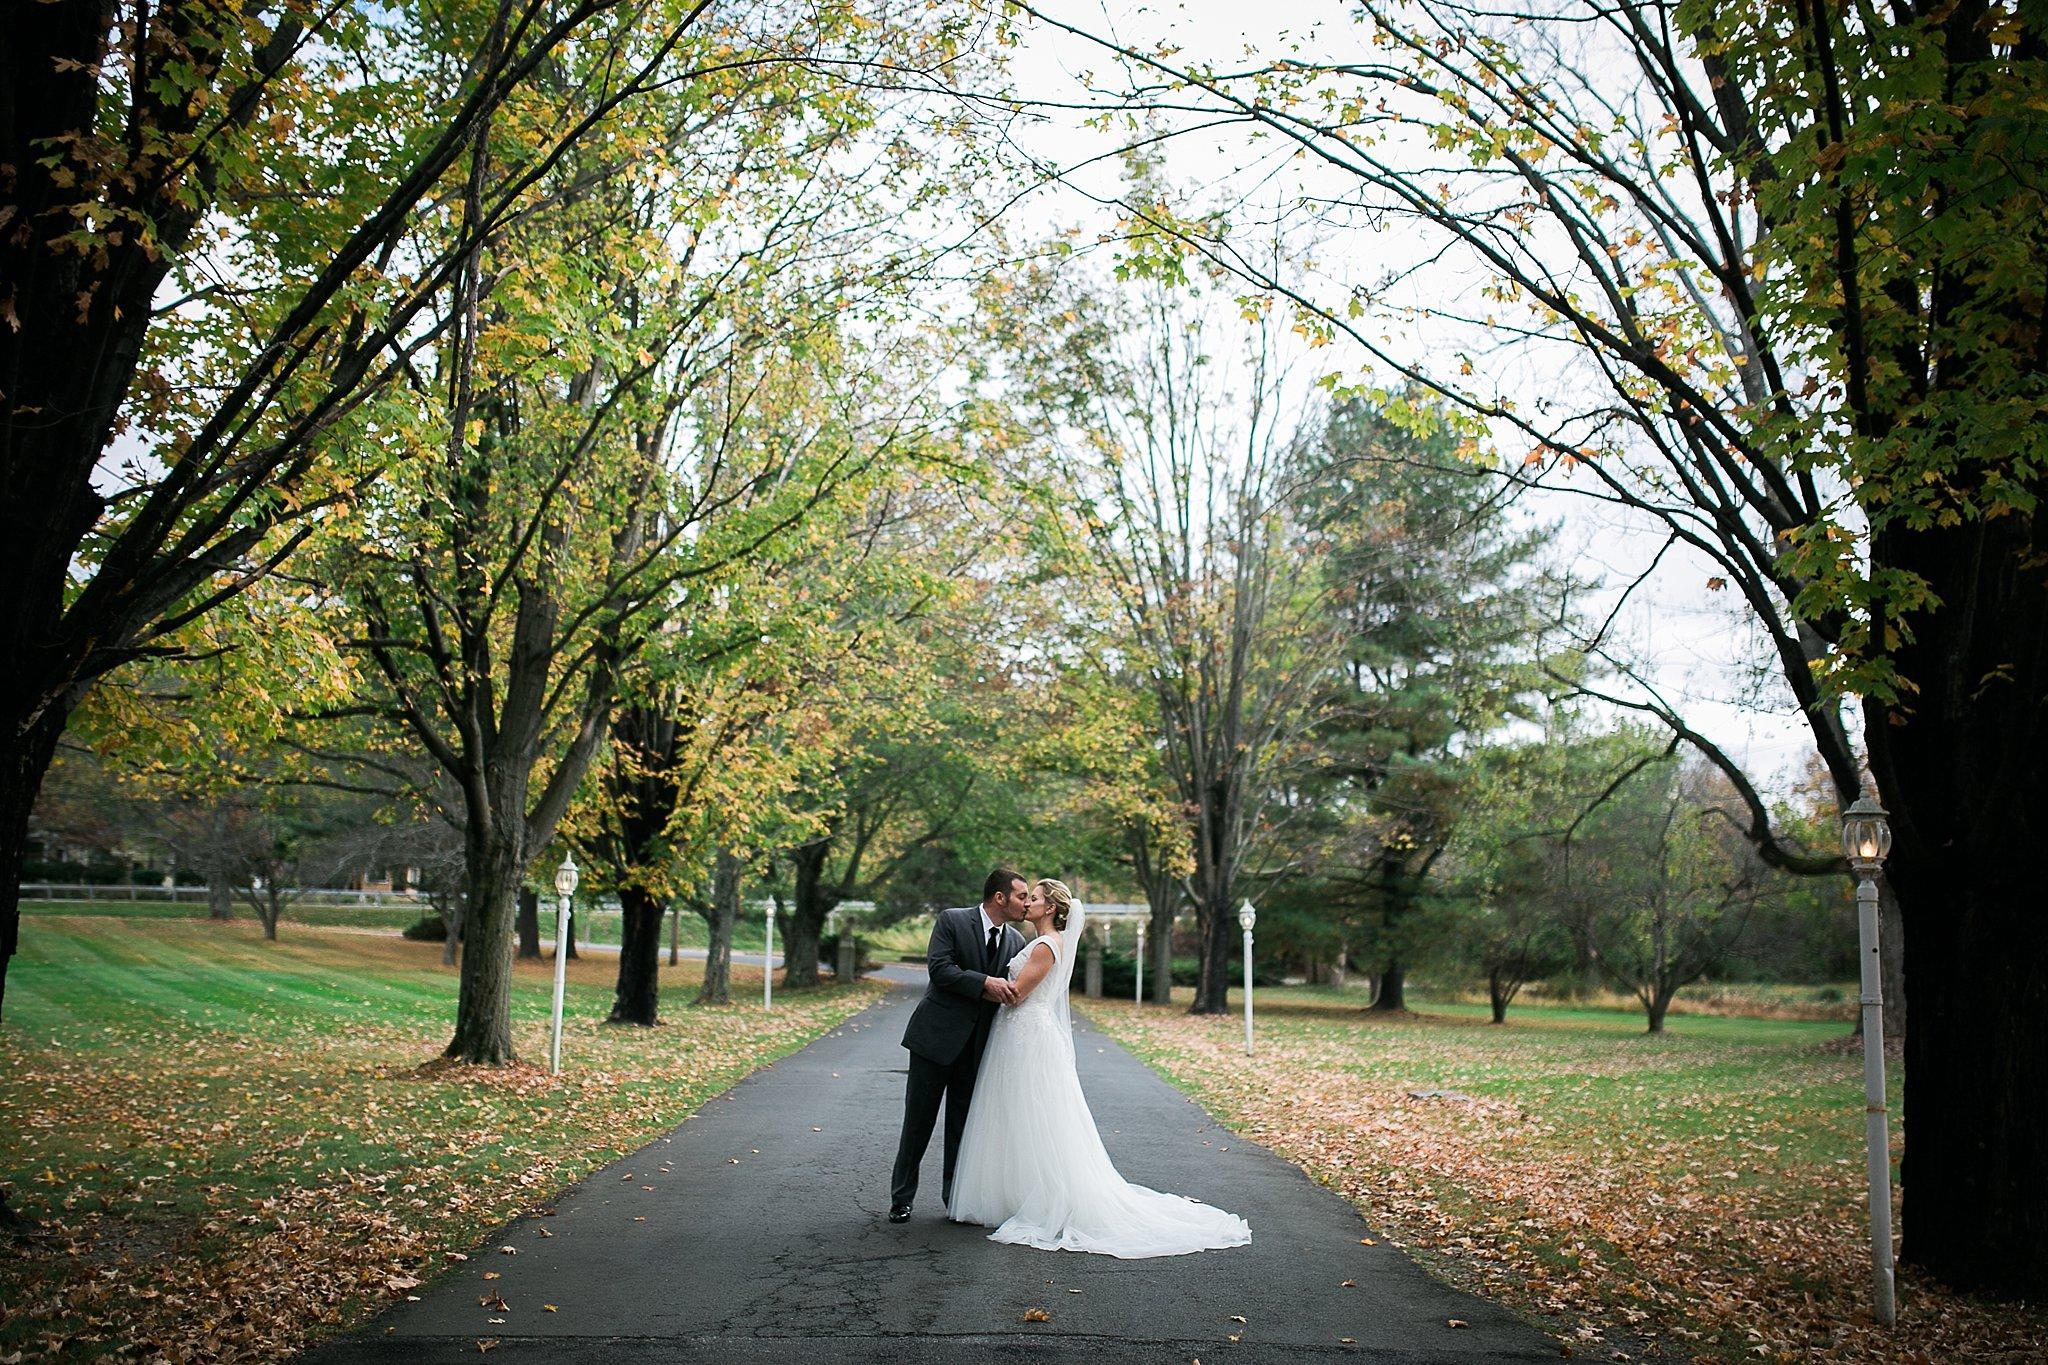 New Windsor New York Hudson Valley New York Wedding Photographer 35.jpg